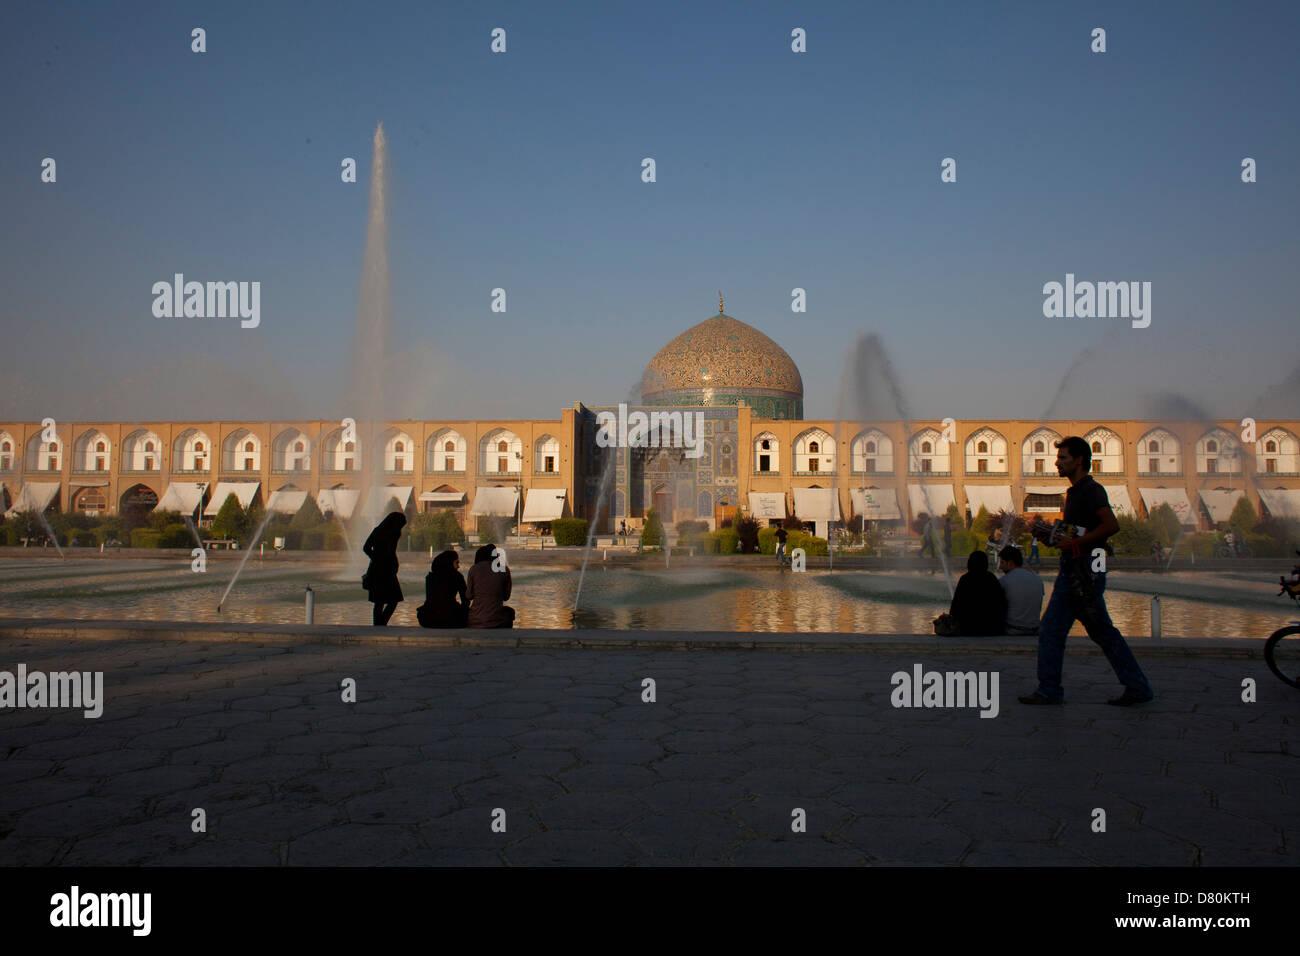 Naqsh-e Jahan square, Iran. - Stock Image